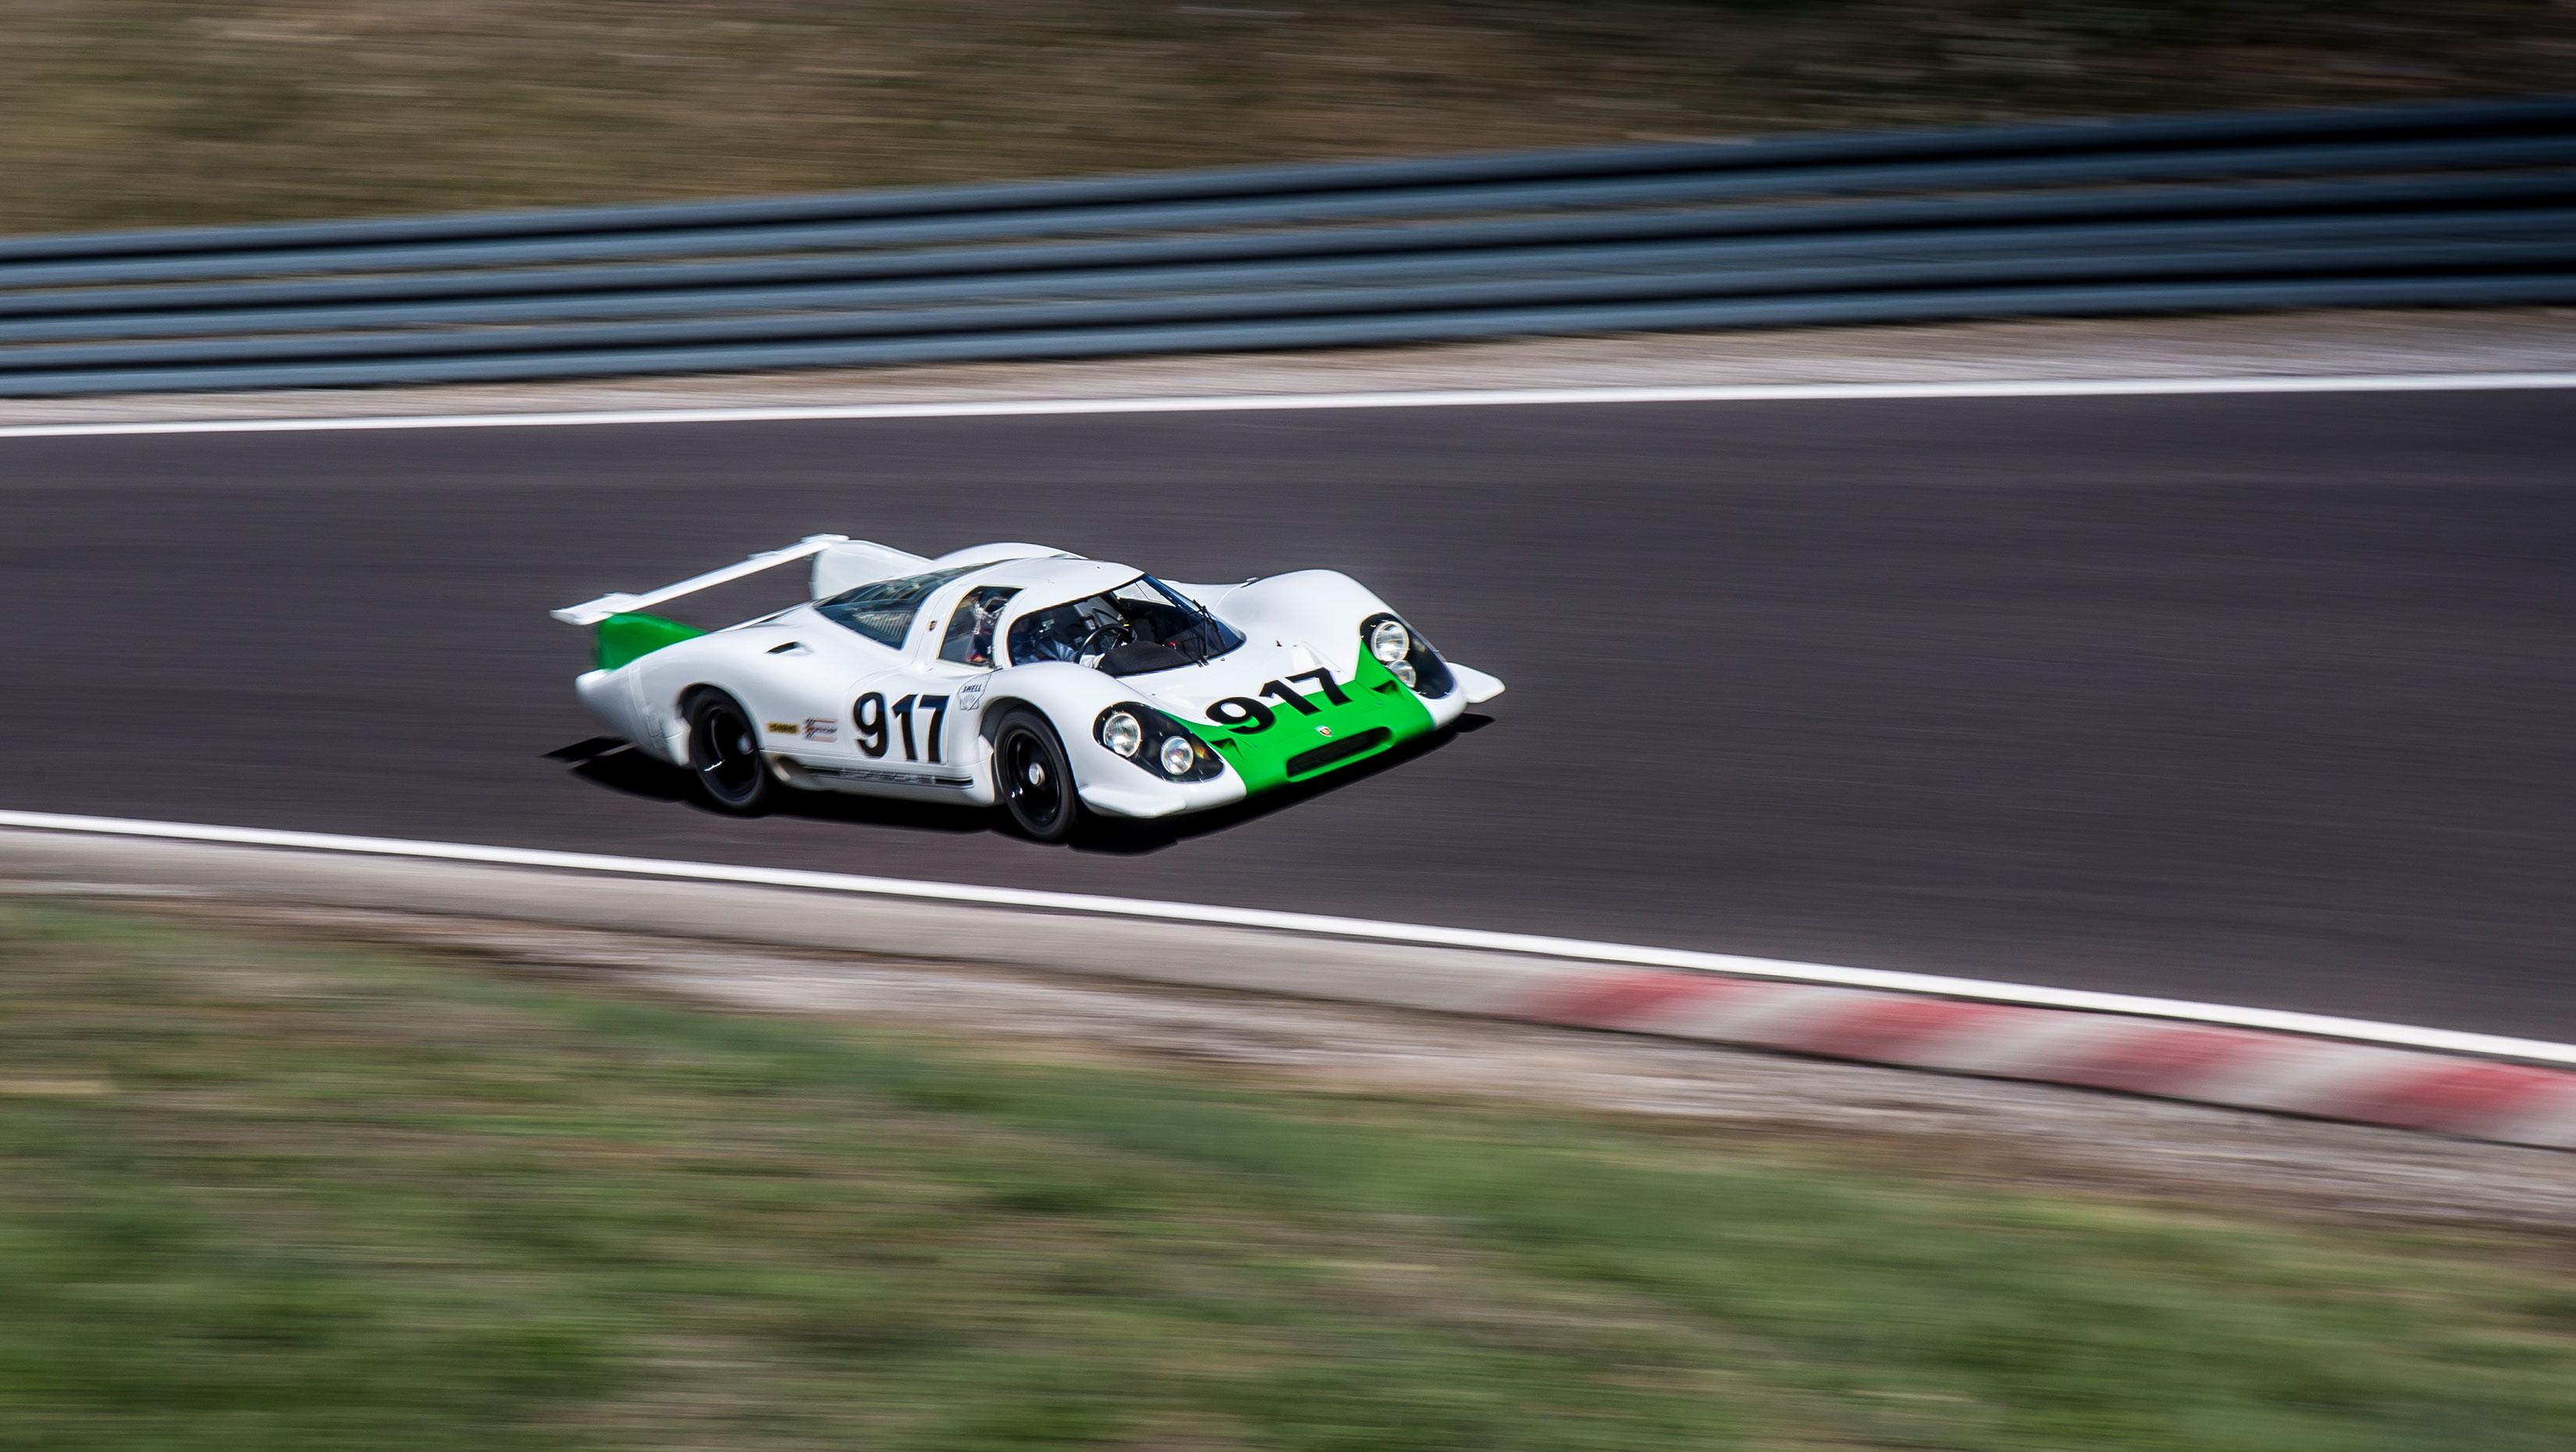 Porsche 917 on the track